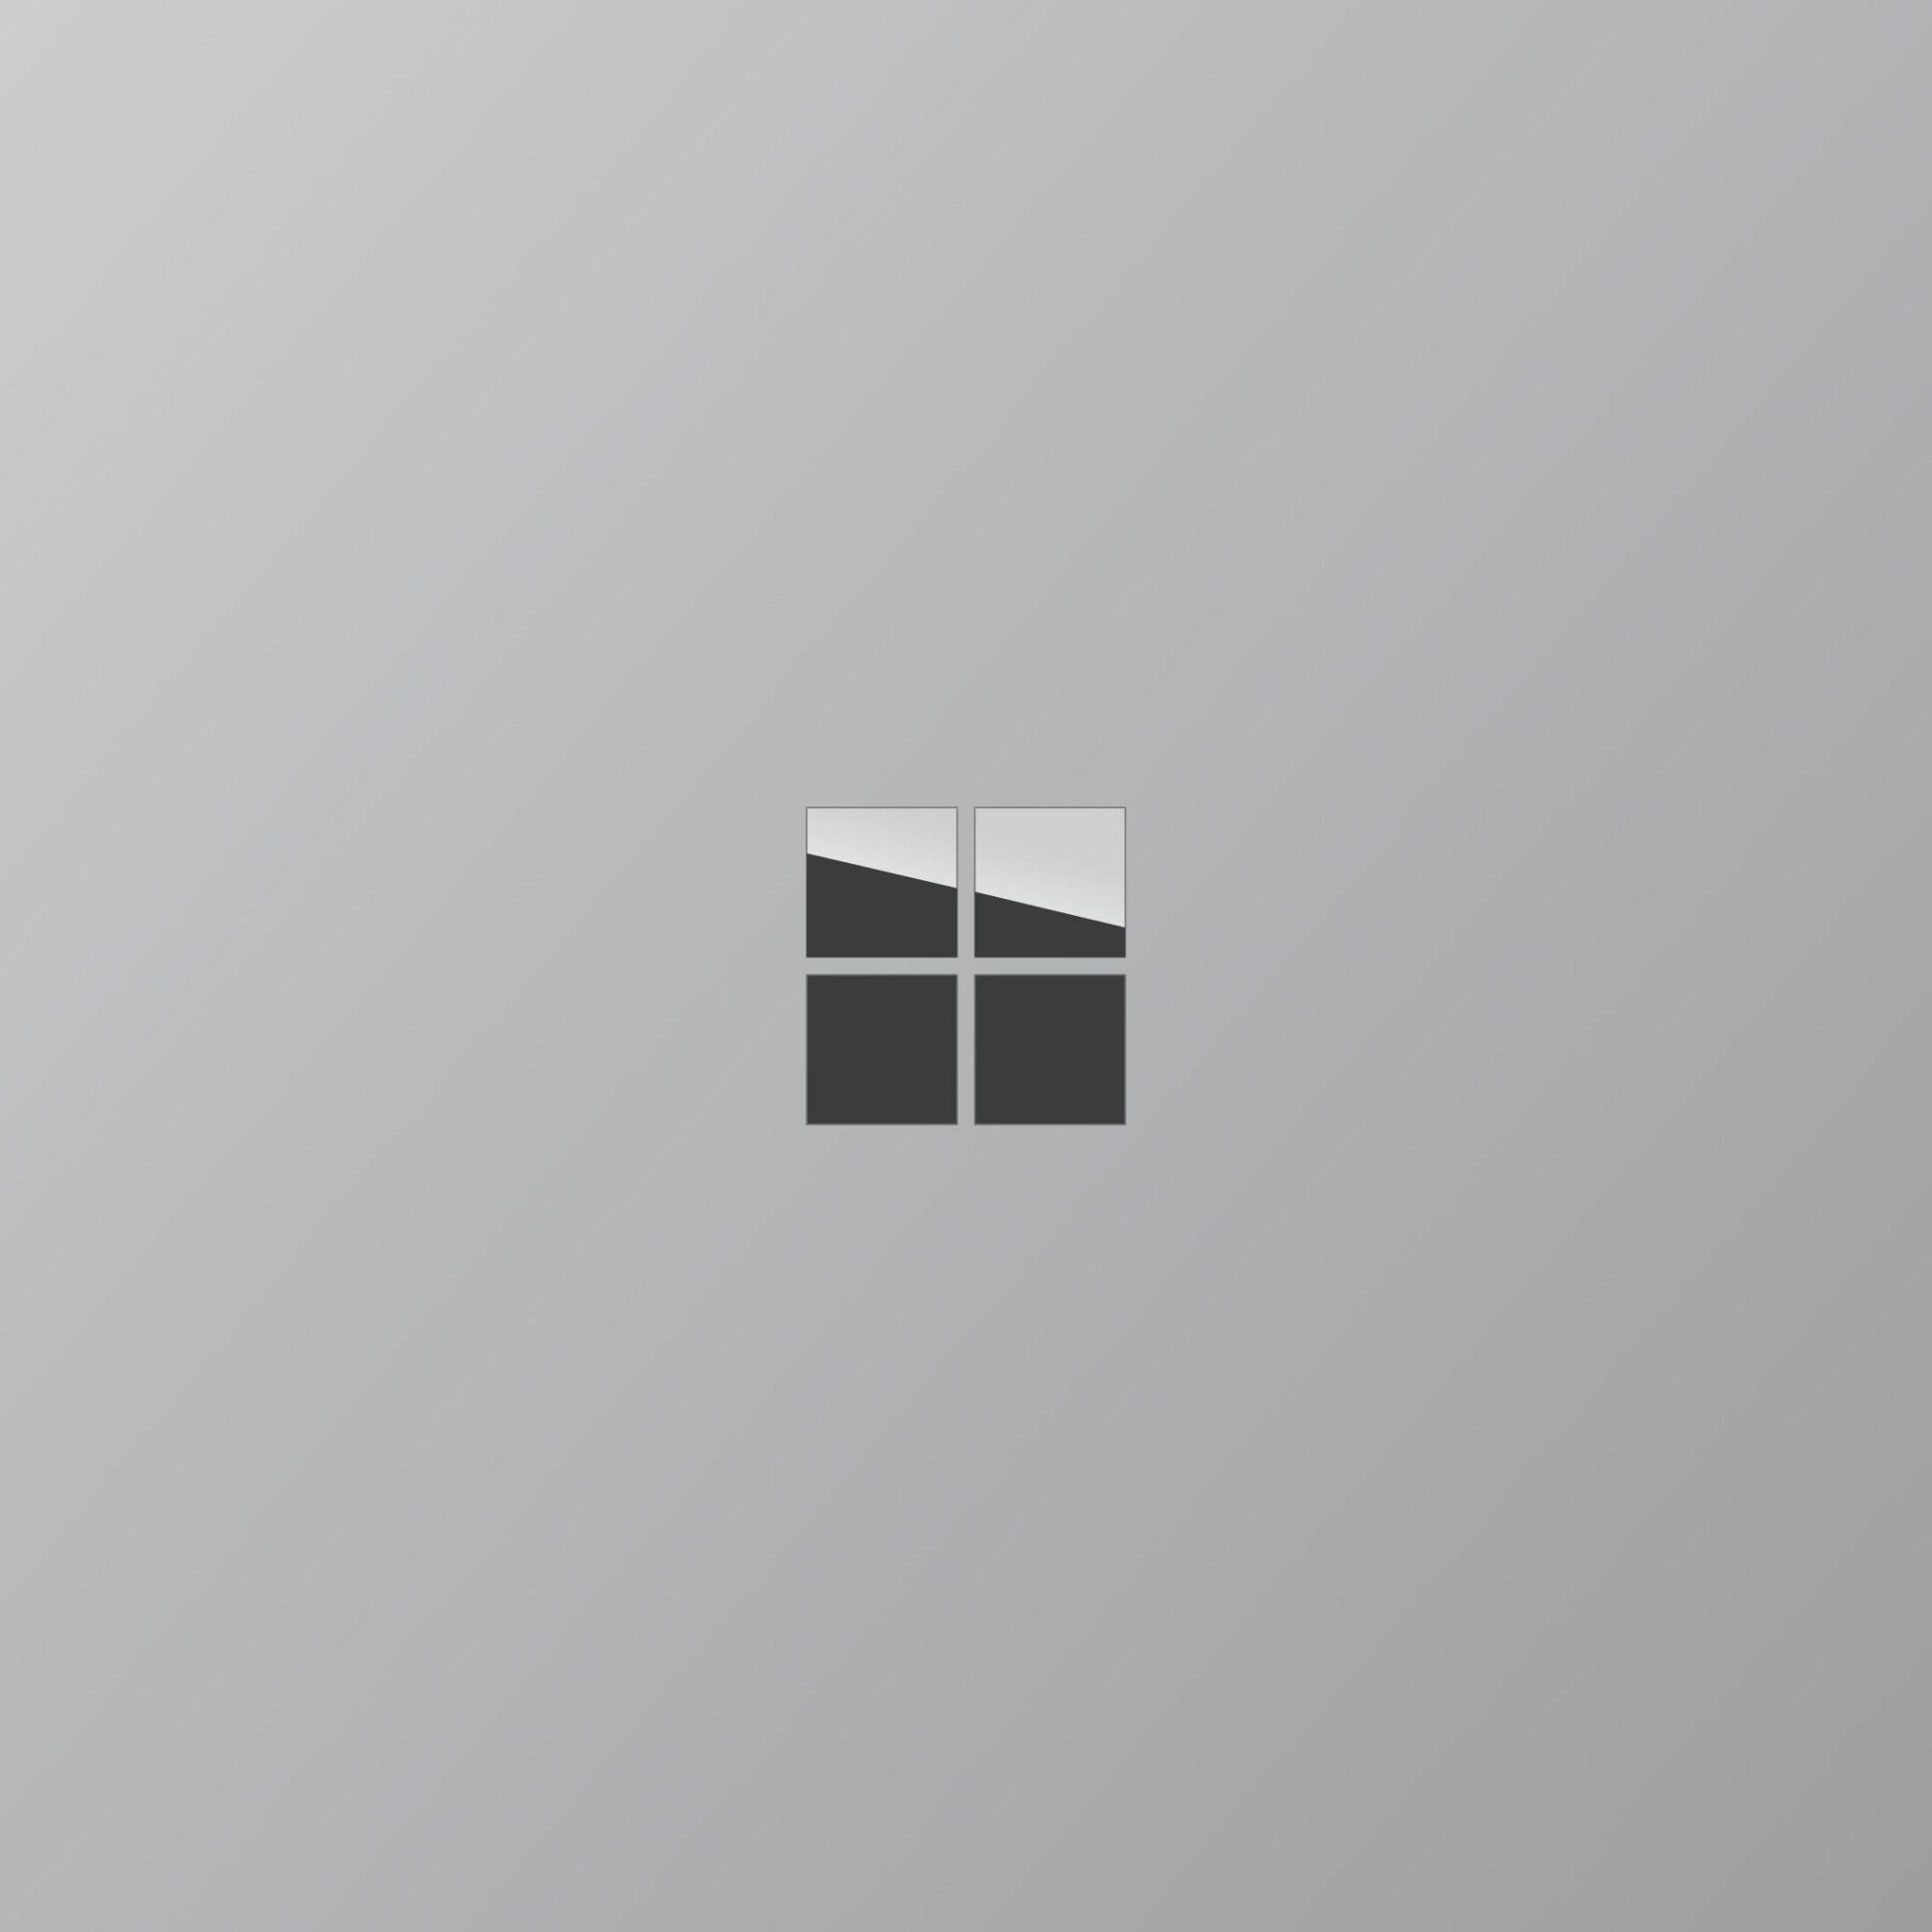 Microsoft Logo Wallpapers.